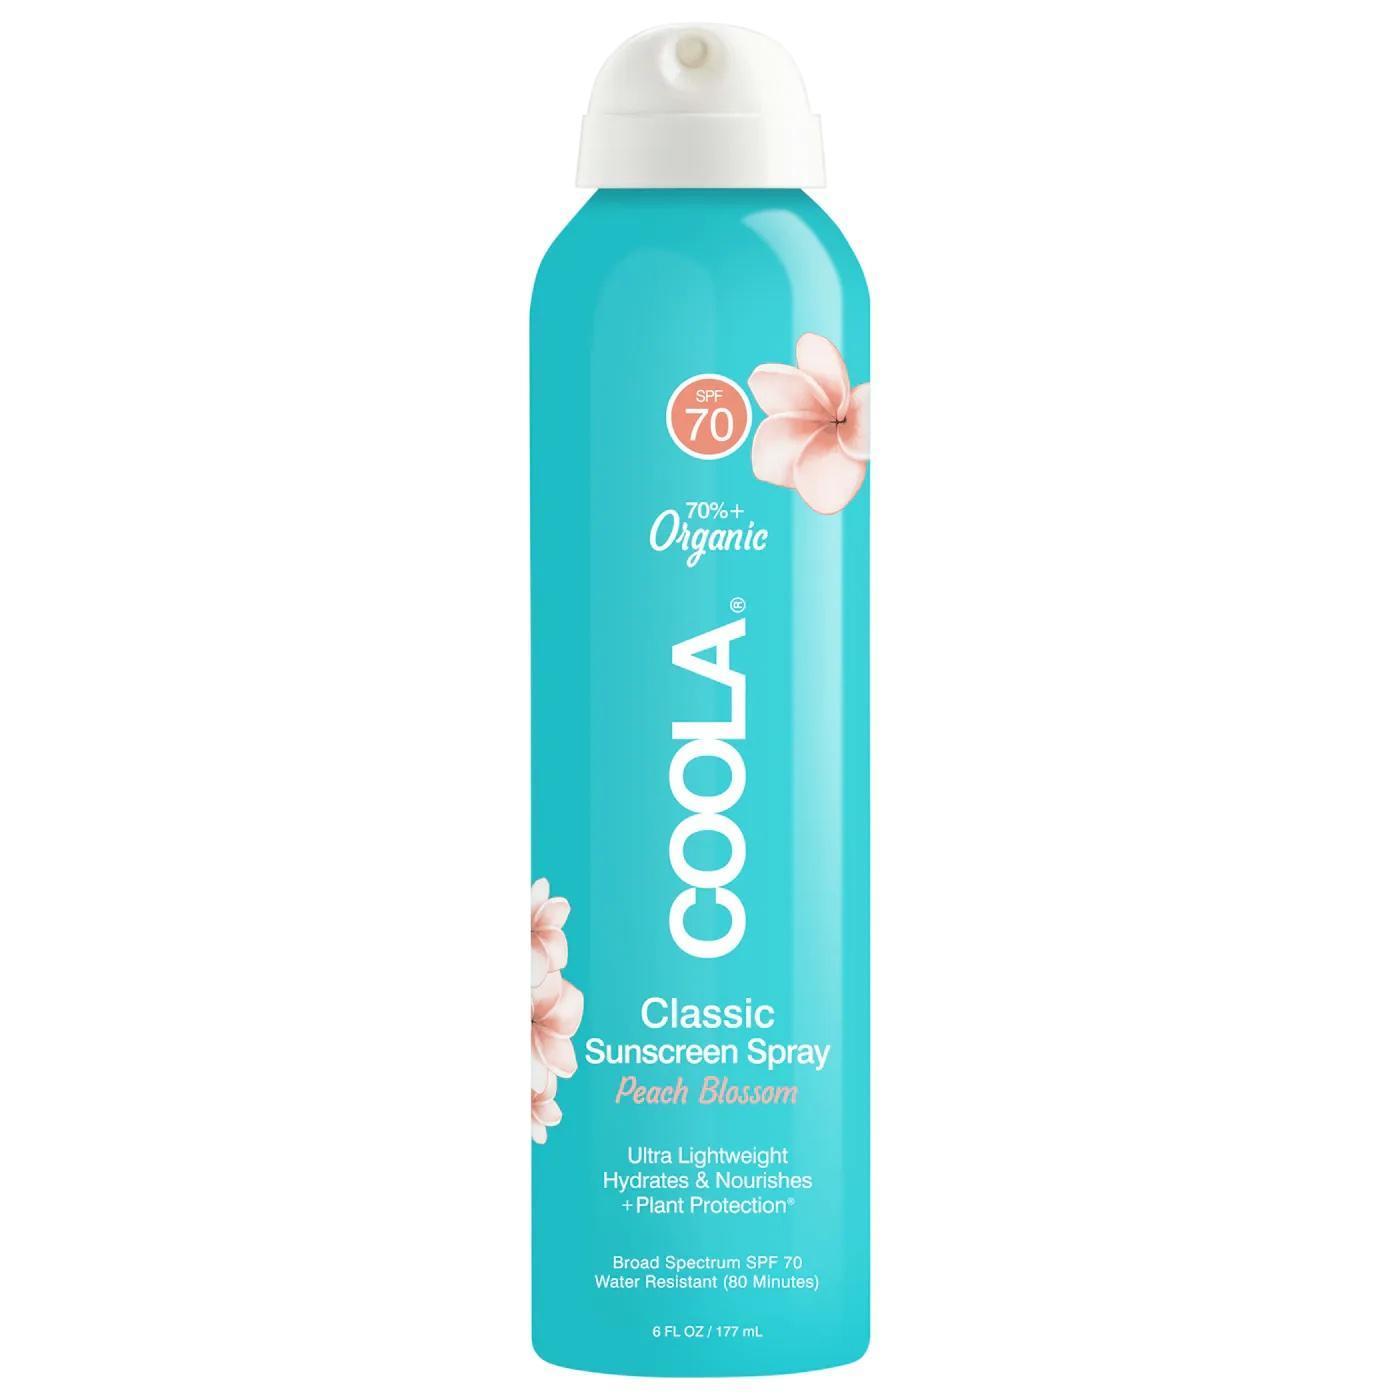 COOLA Classic Body Organic Sunscreen Spray Peach Blossom